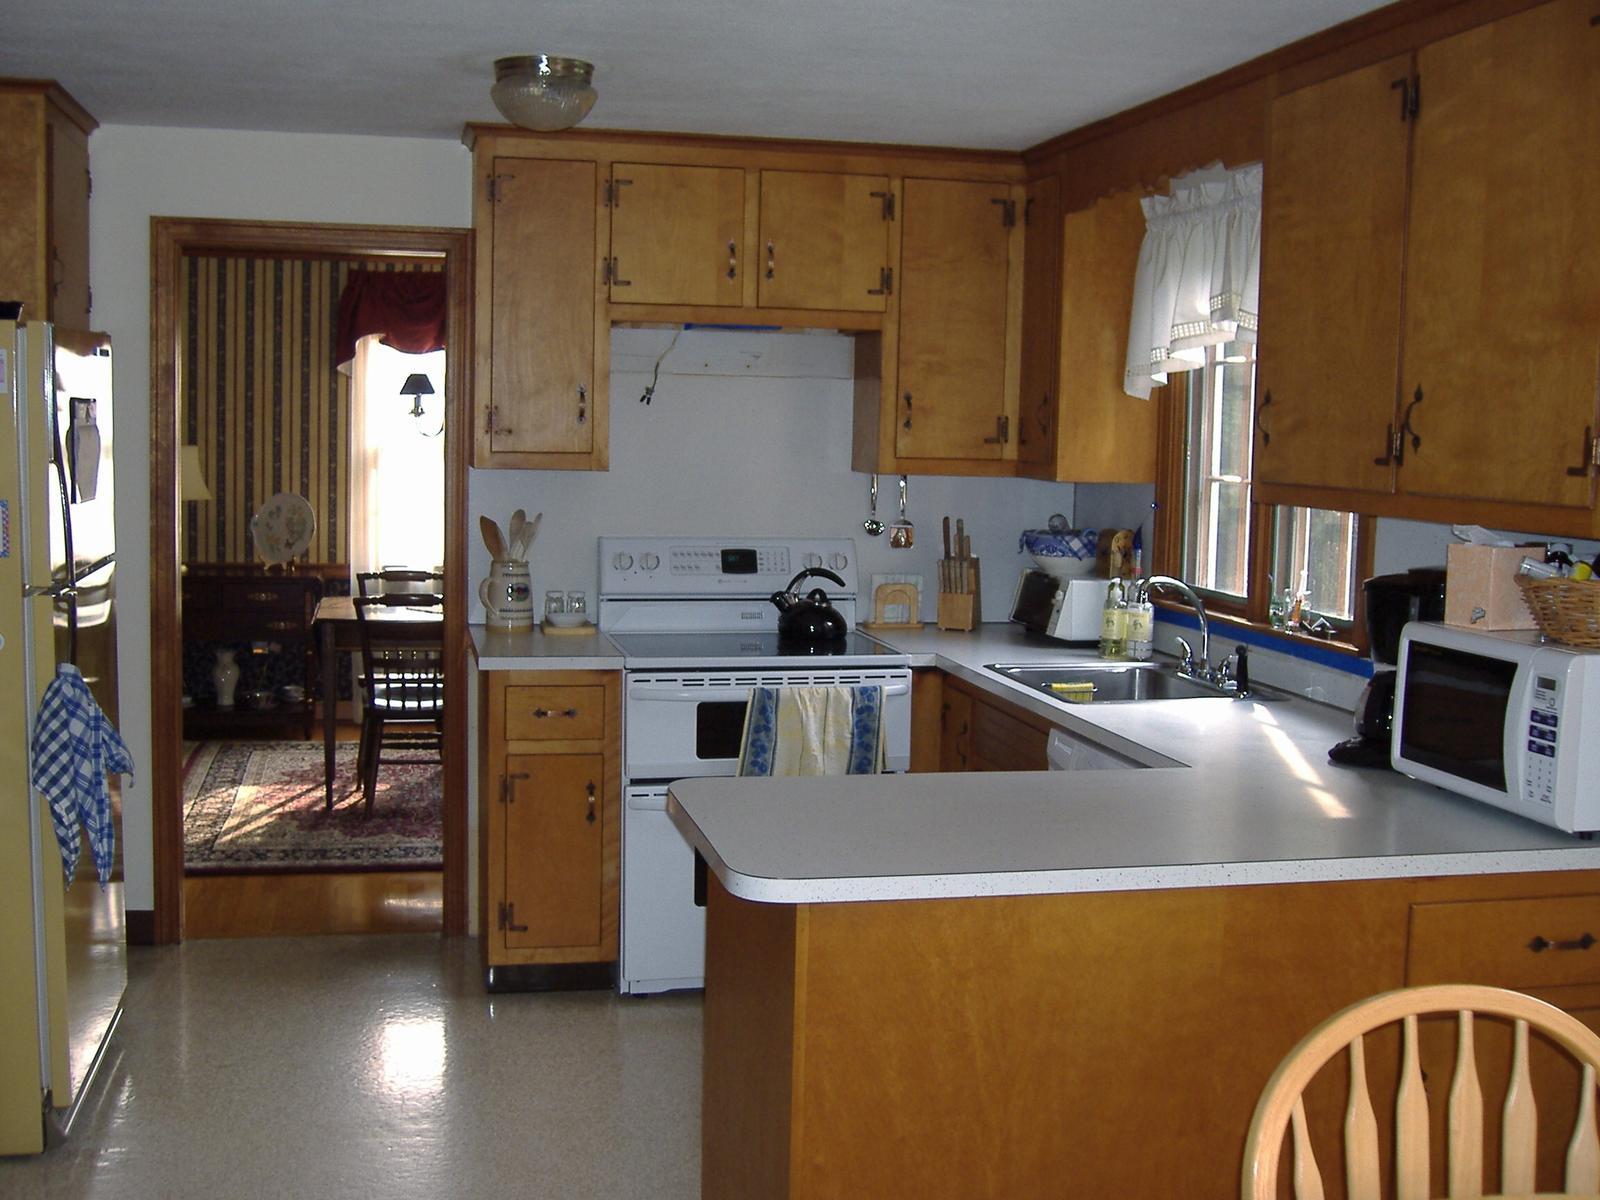 granite kitchen remodeling hartford area kitchen remodel Granite Kitchen remodeling Hartford area